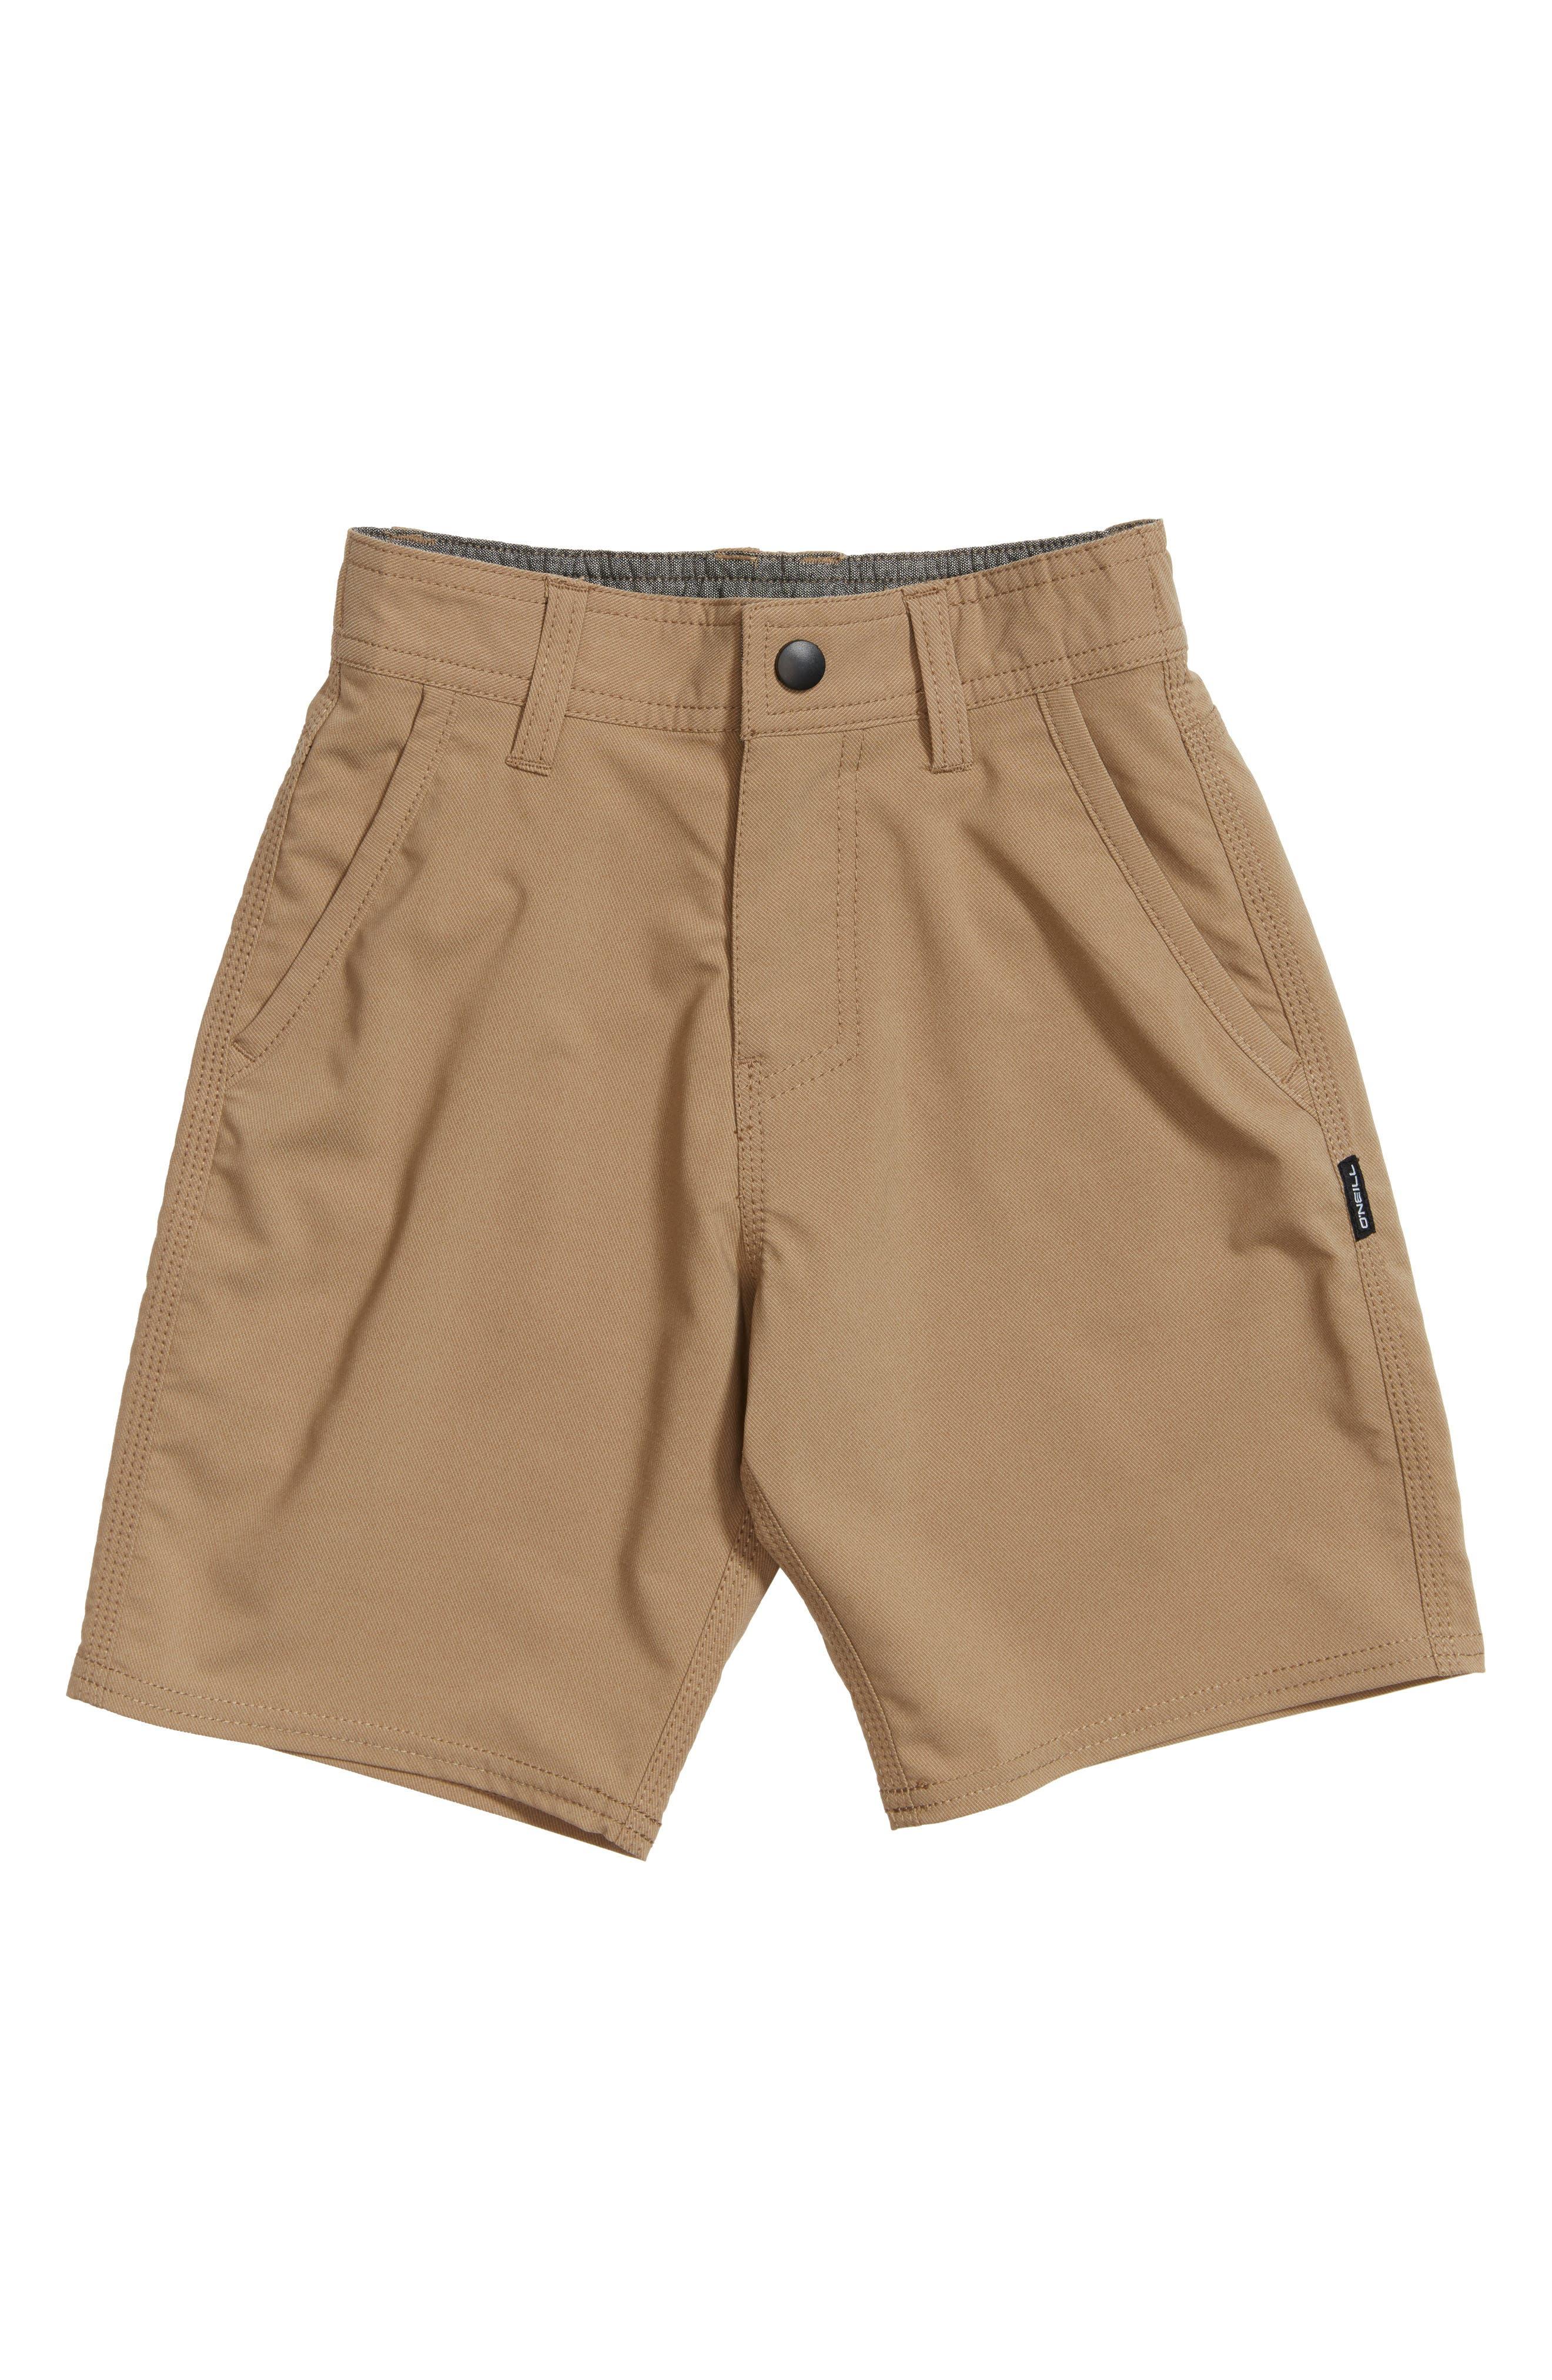 Stockton Hybrid Shorts,                         Main,                         color, Khaki